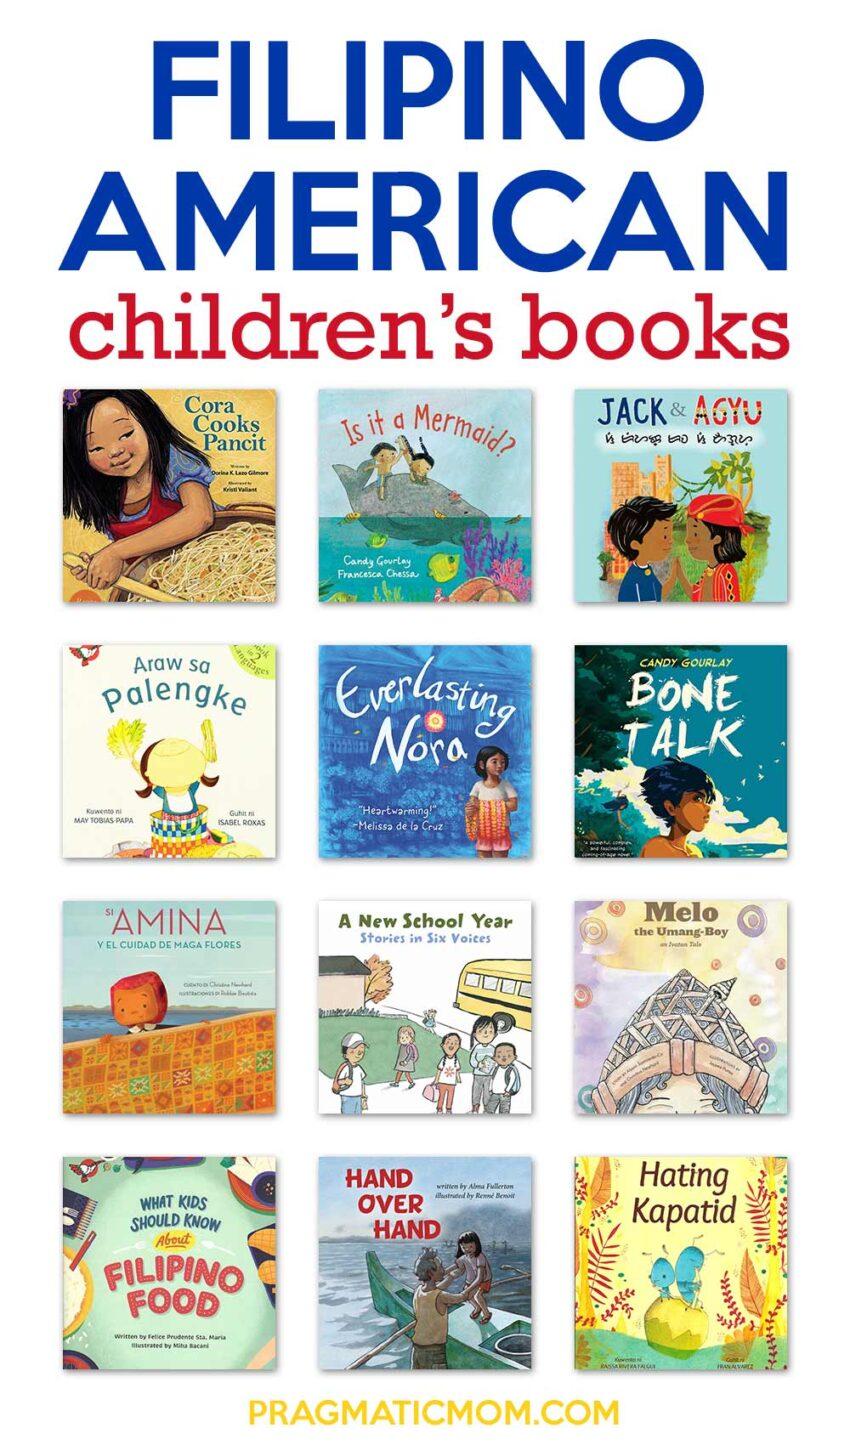 Filipino American Children's Books